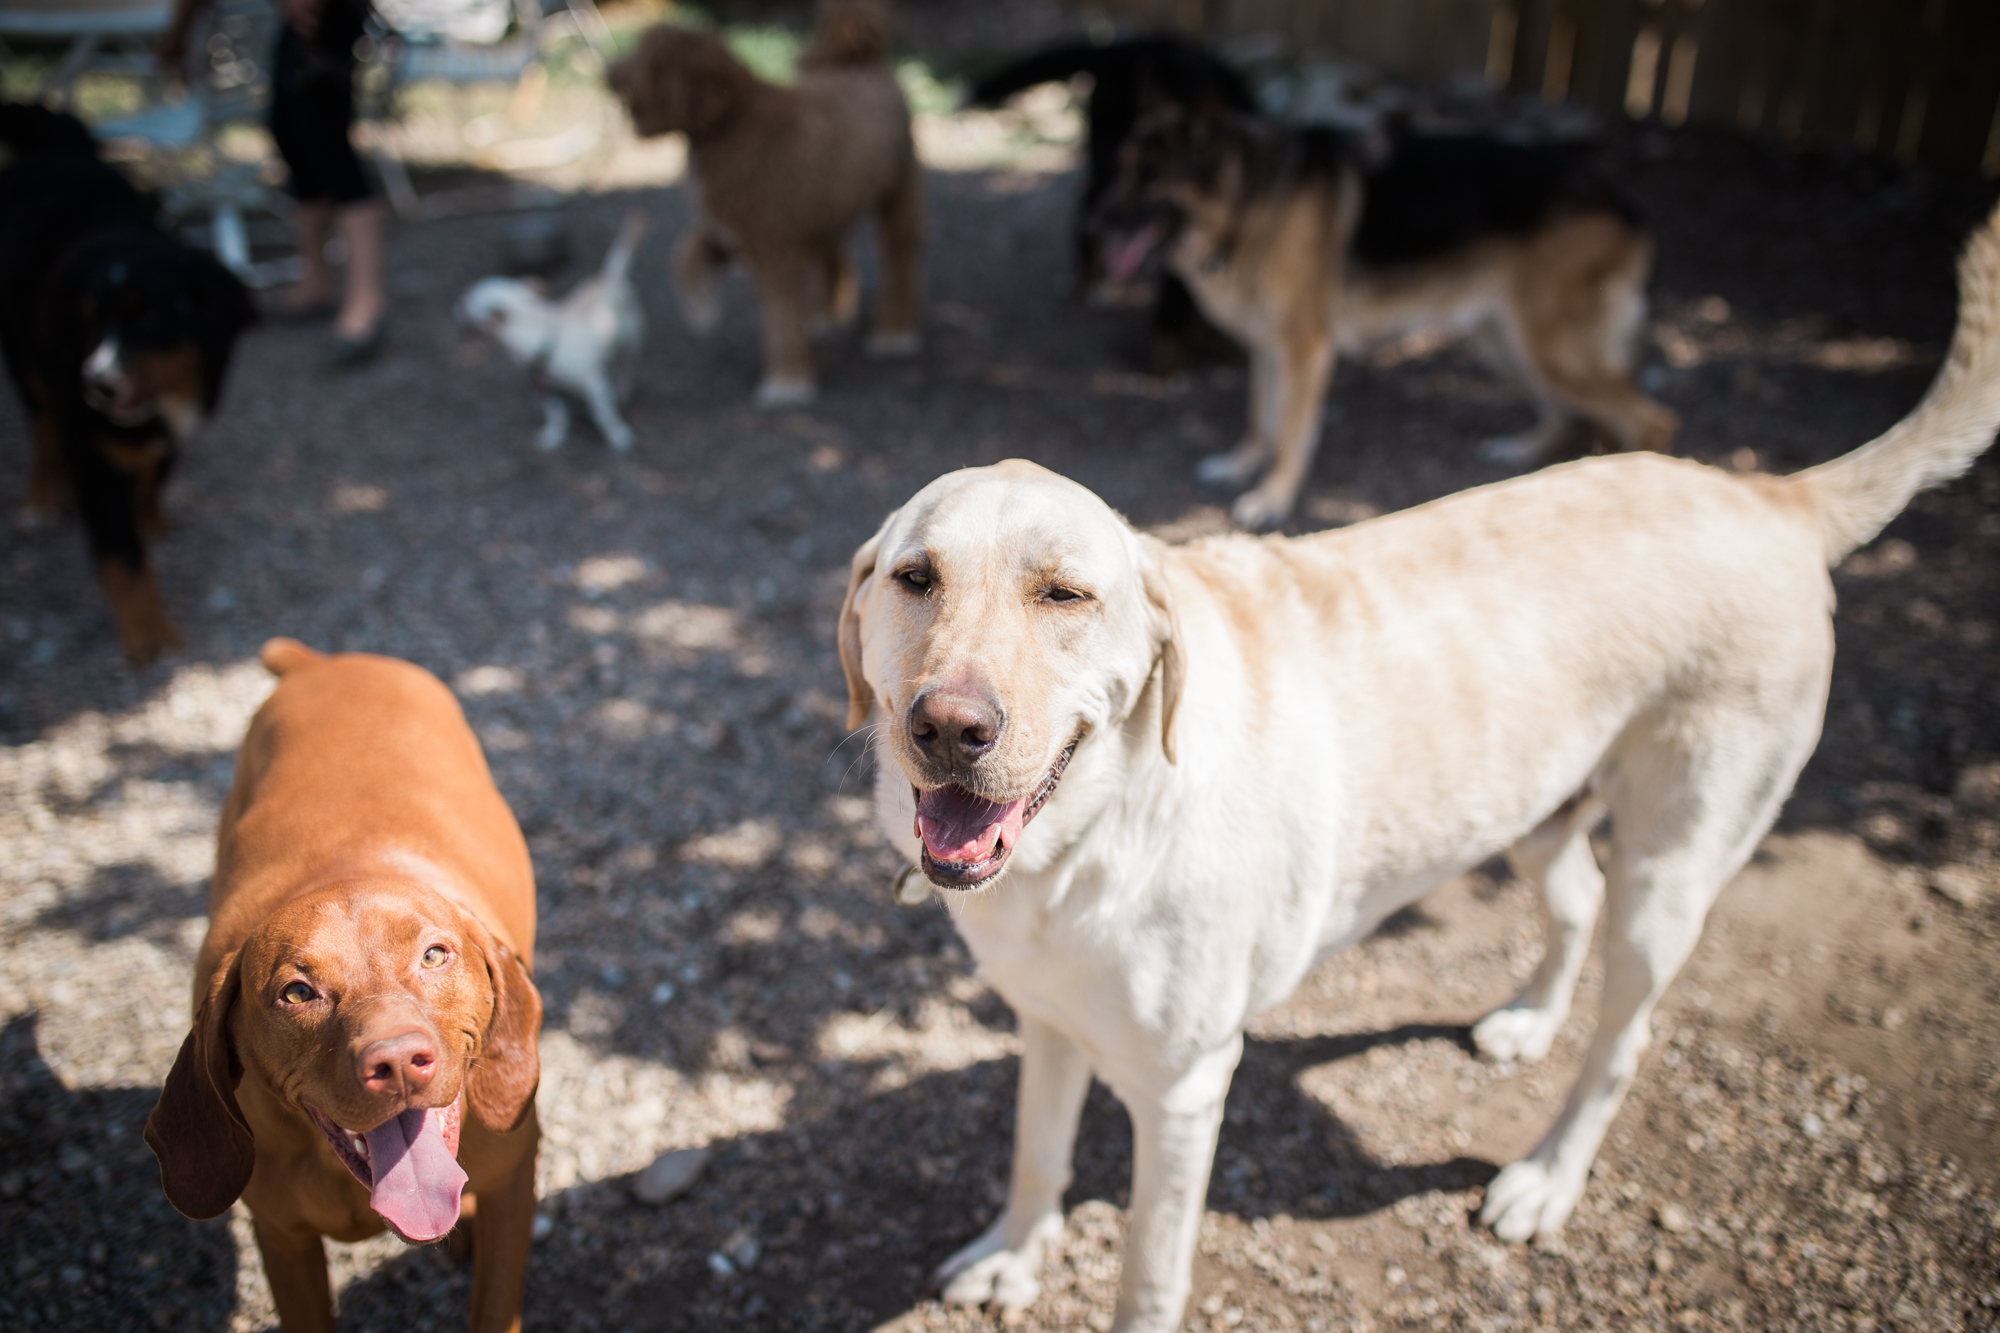 Barking-Good-Dogs-7.jpg